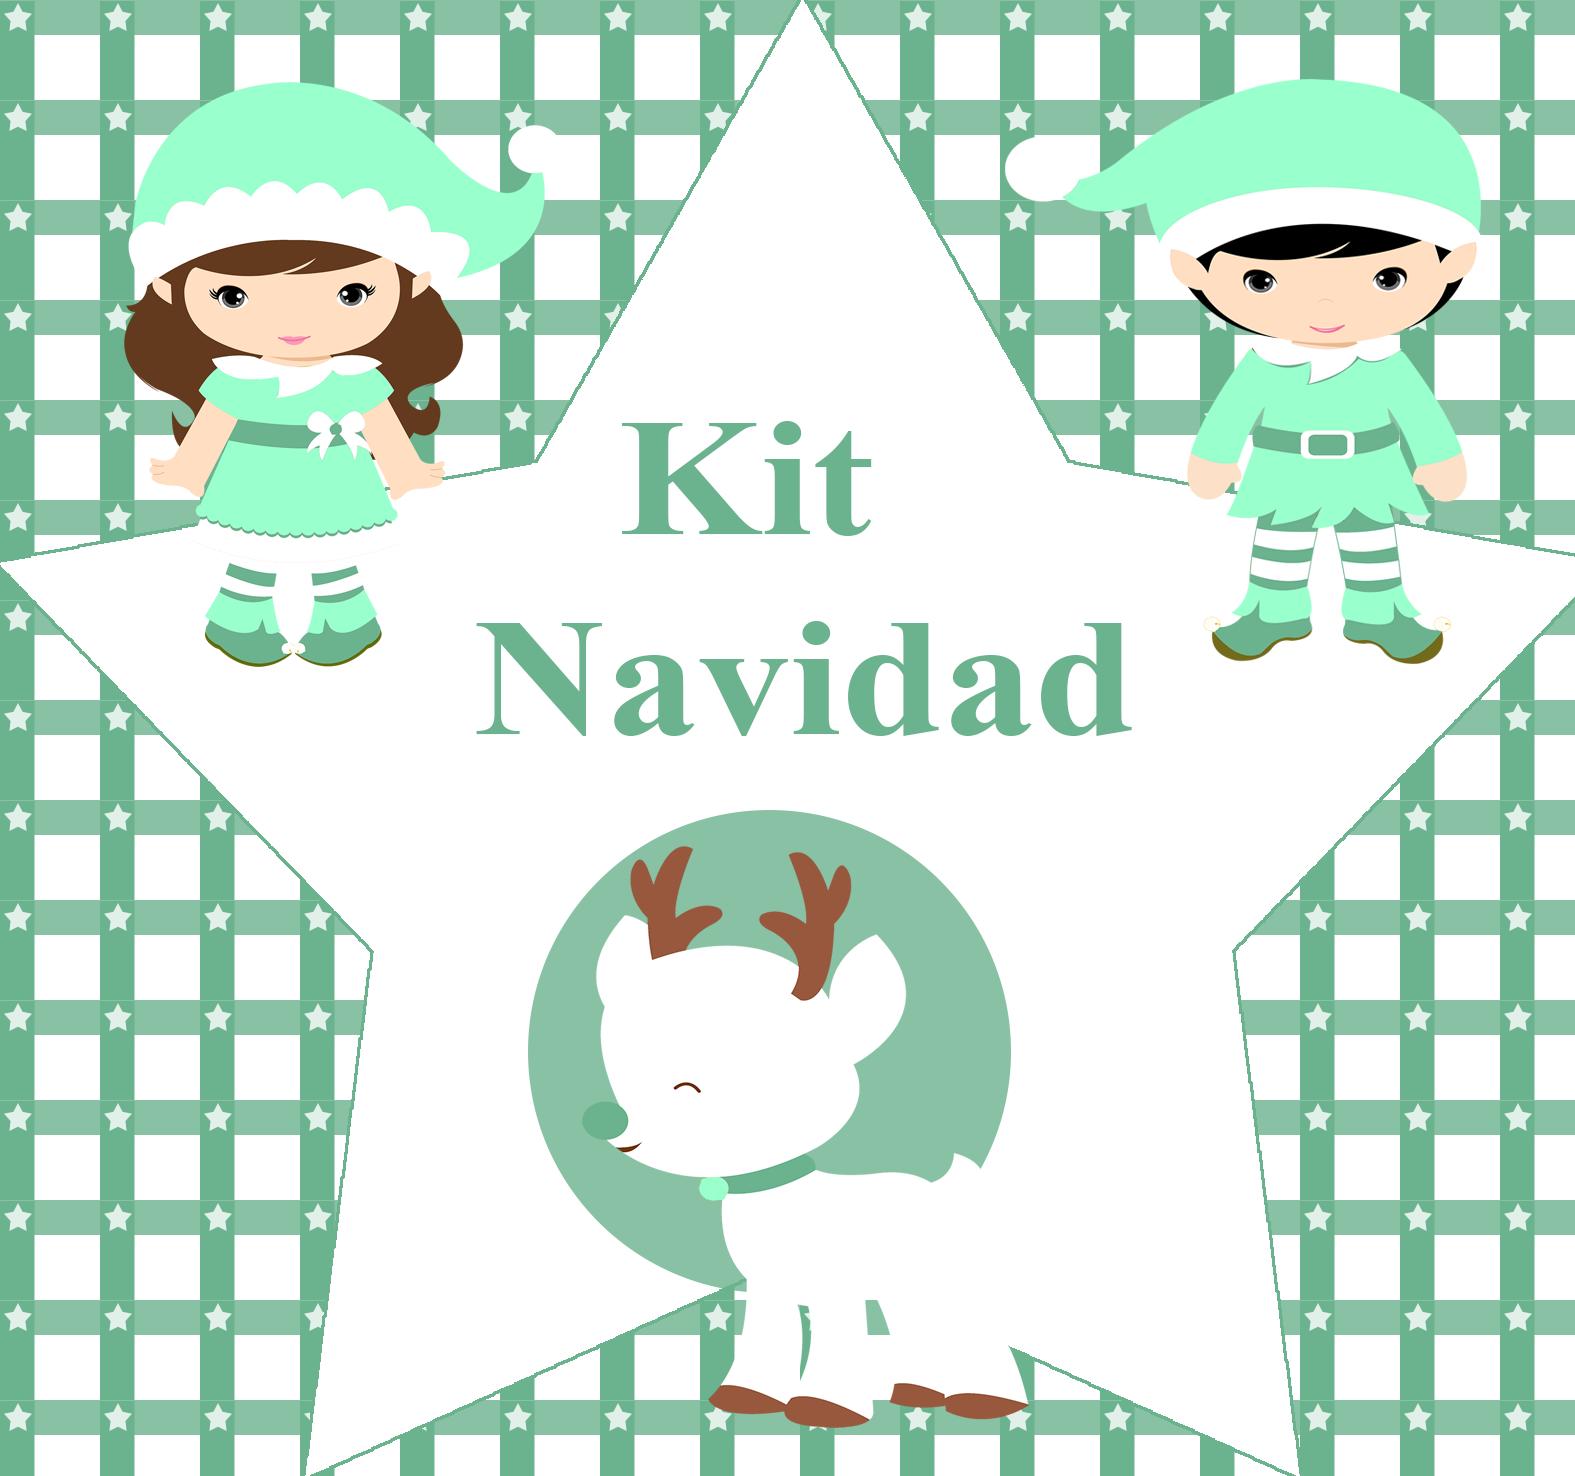 Sweet Party Barcelona: Kits imprimibles de Navidad gratis!!